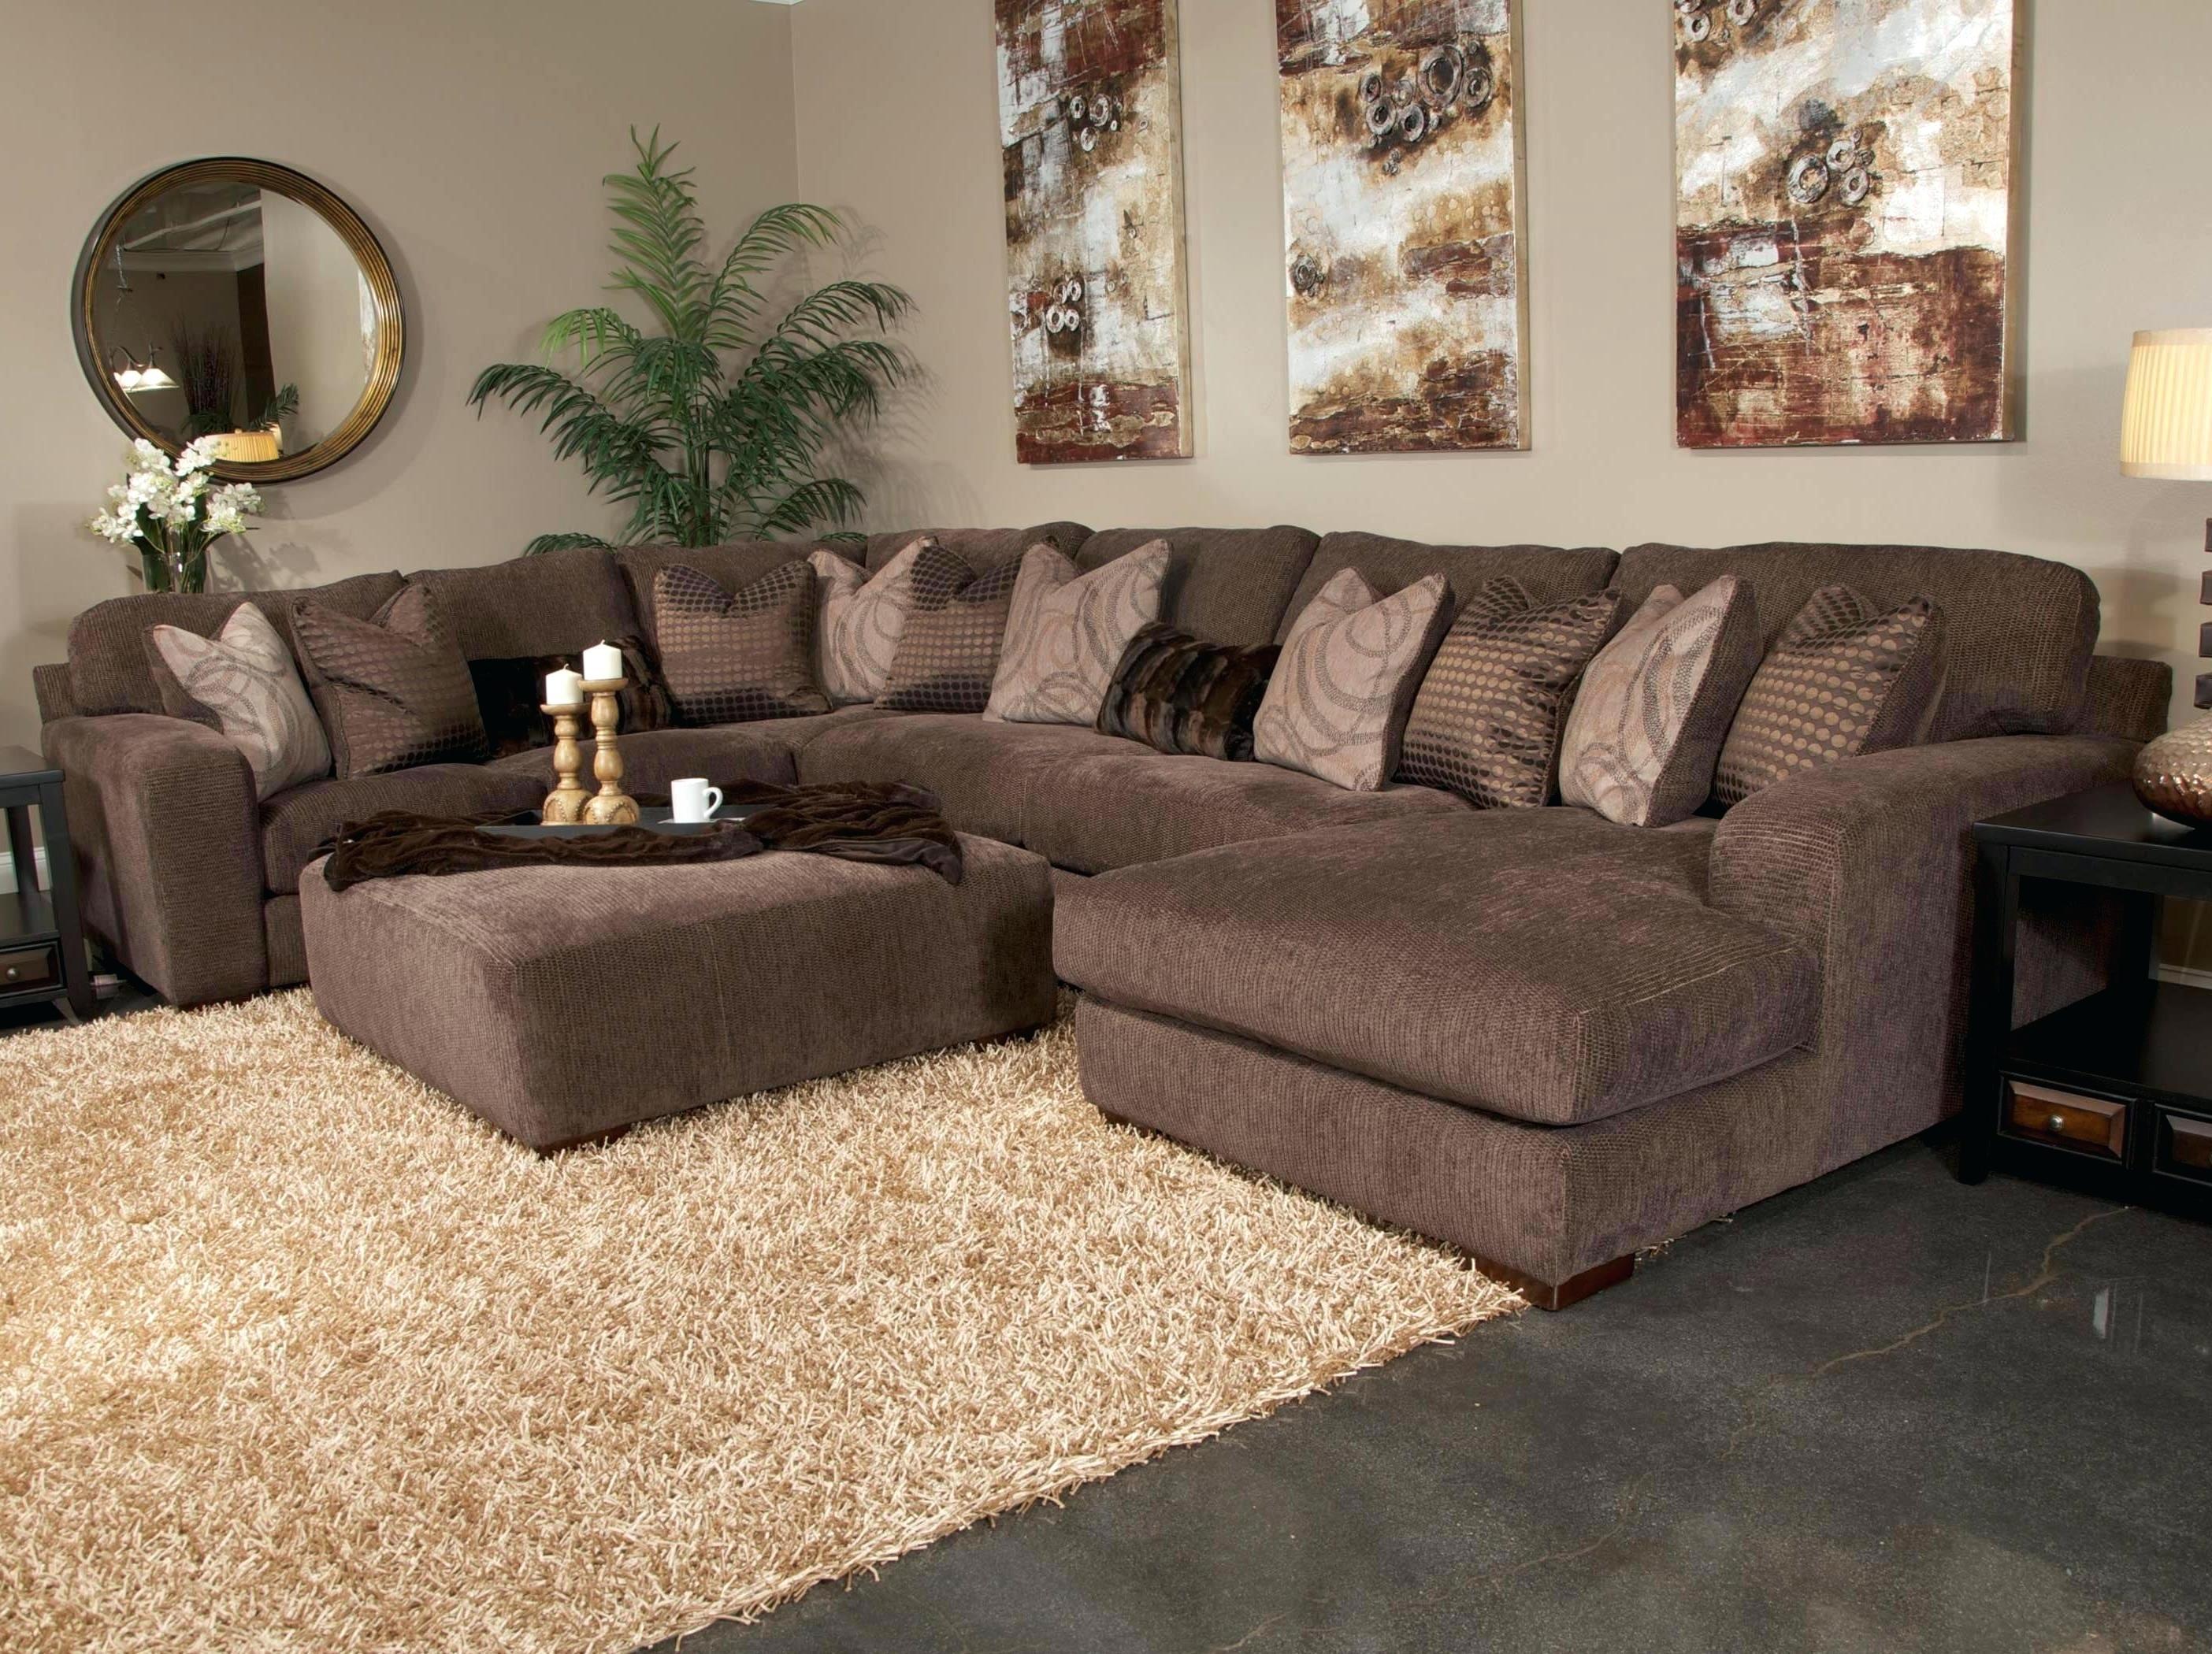 Fashionable Jackson Tn Sectional Sofas Inside Outstanding Jackson Sectional Sofas – Ipwhois (View 4 of 20)